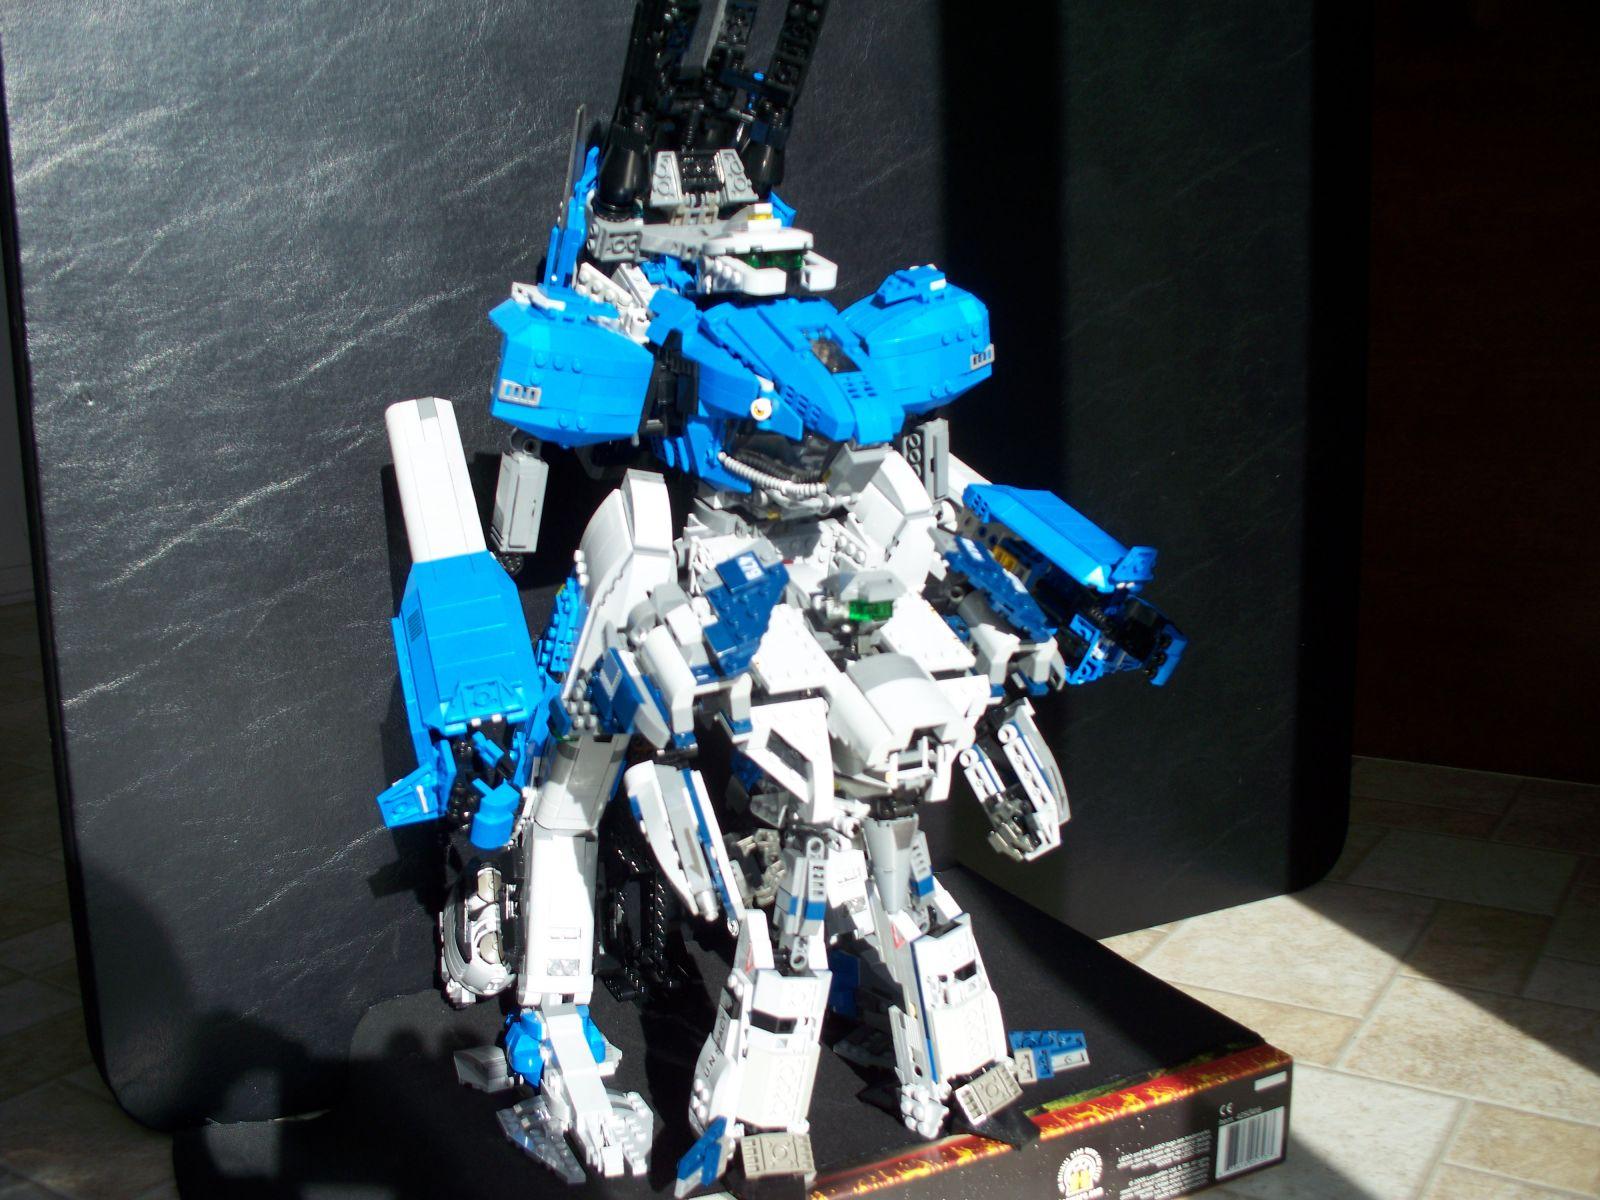 LEGO Monster,VF 4, BrickCon2014 006